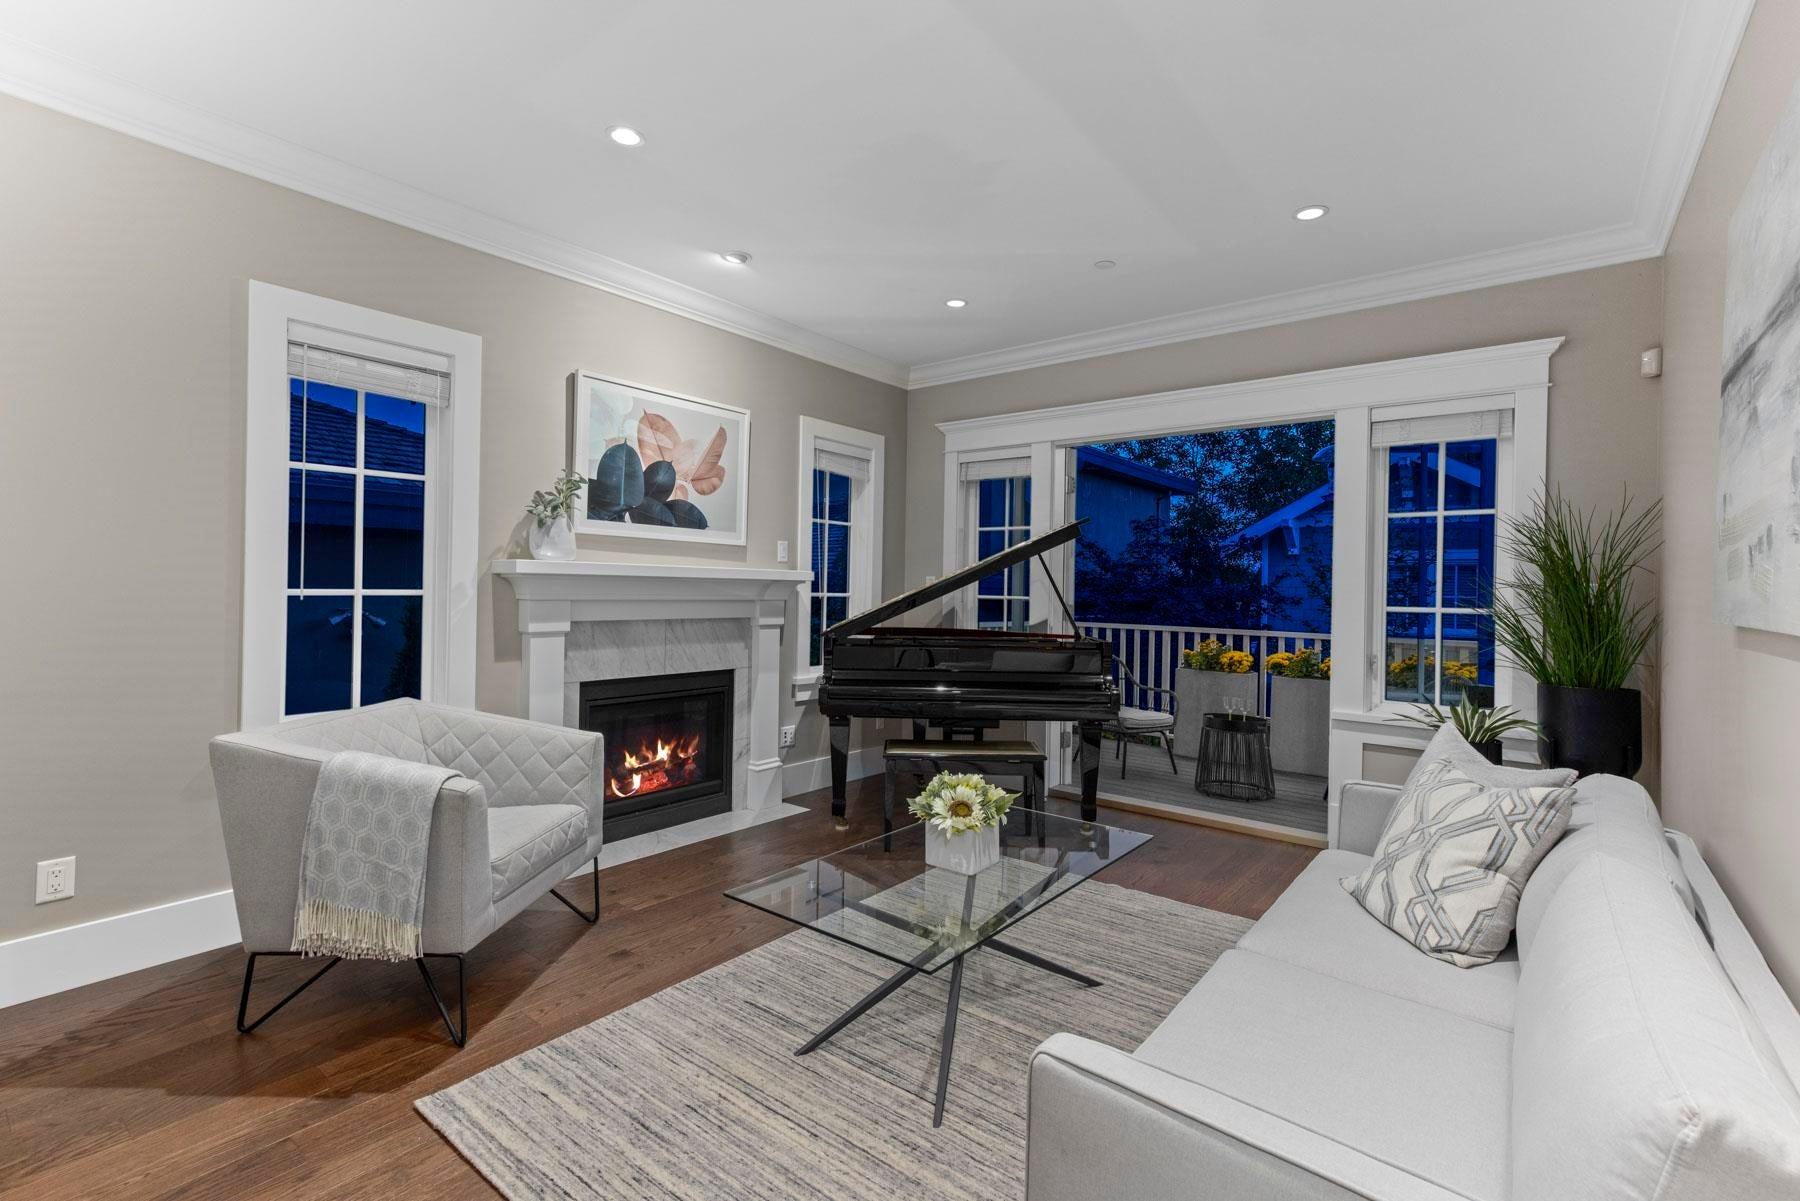 1421 GORDON AVENUE - Ambleside House/Single Family for sale, 3 Bedrooms (R2617756) - #6